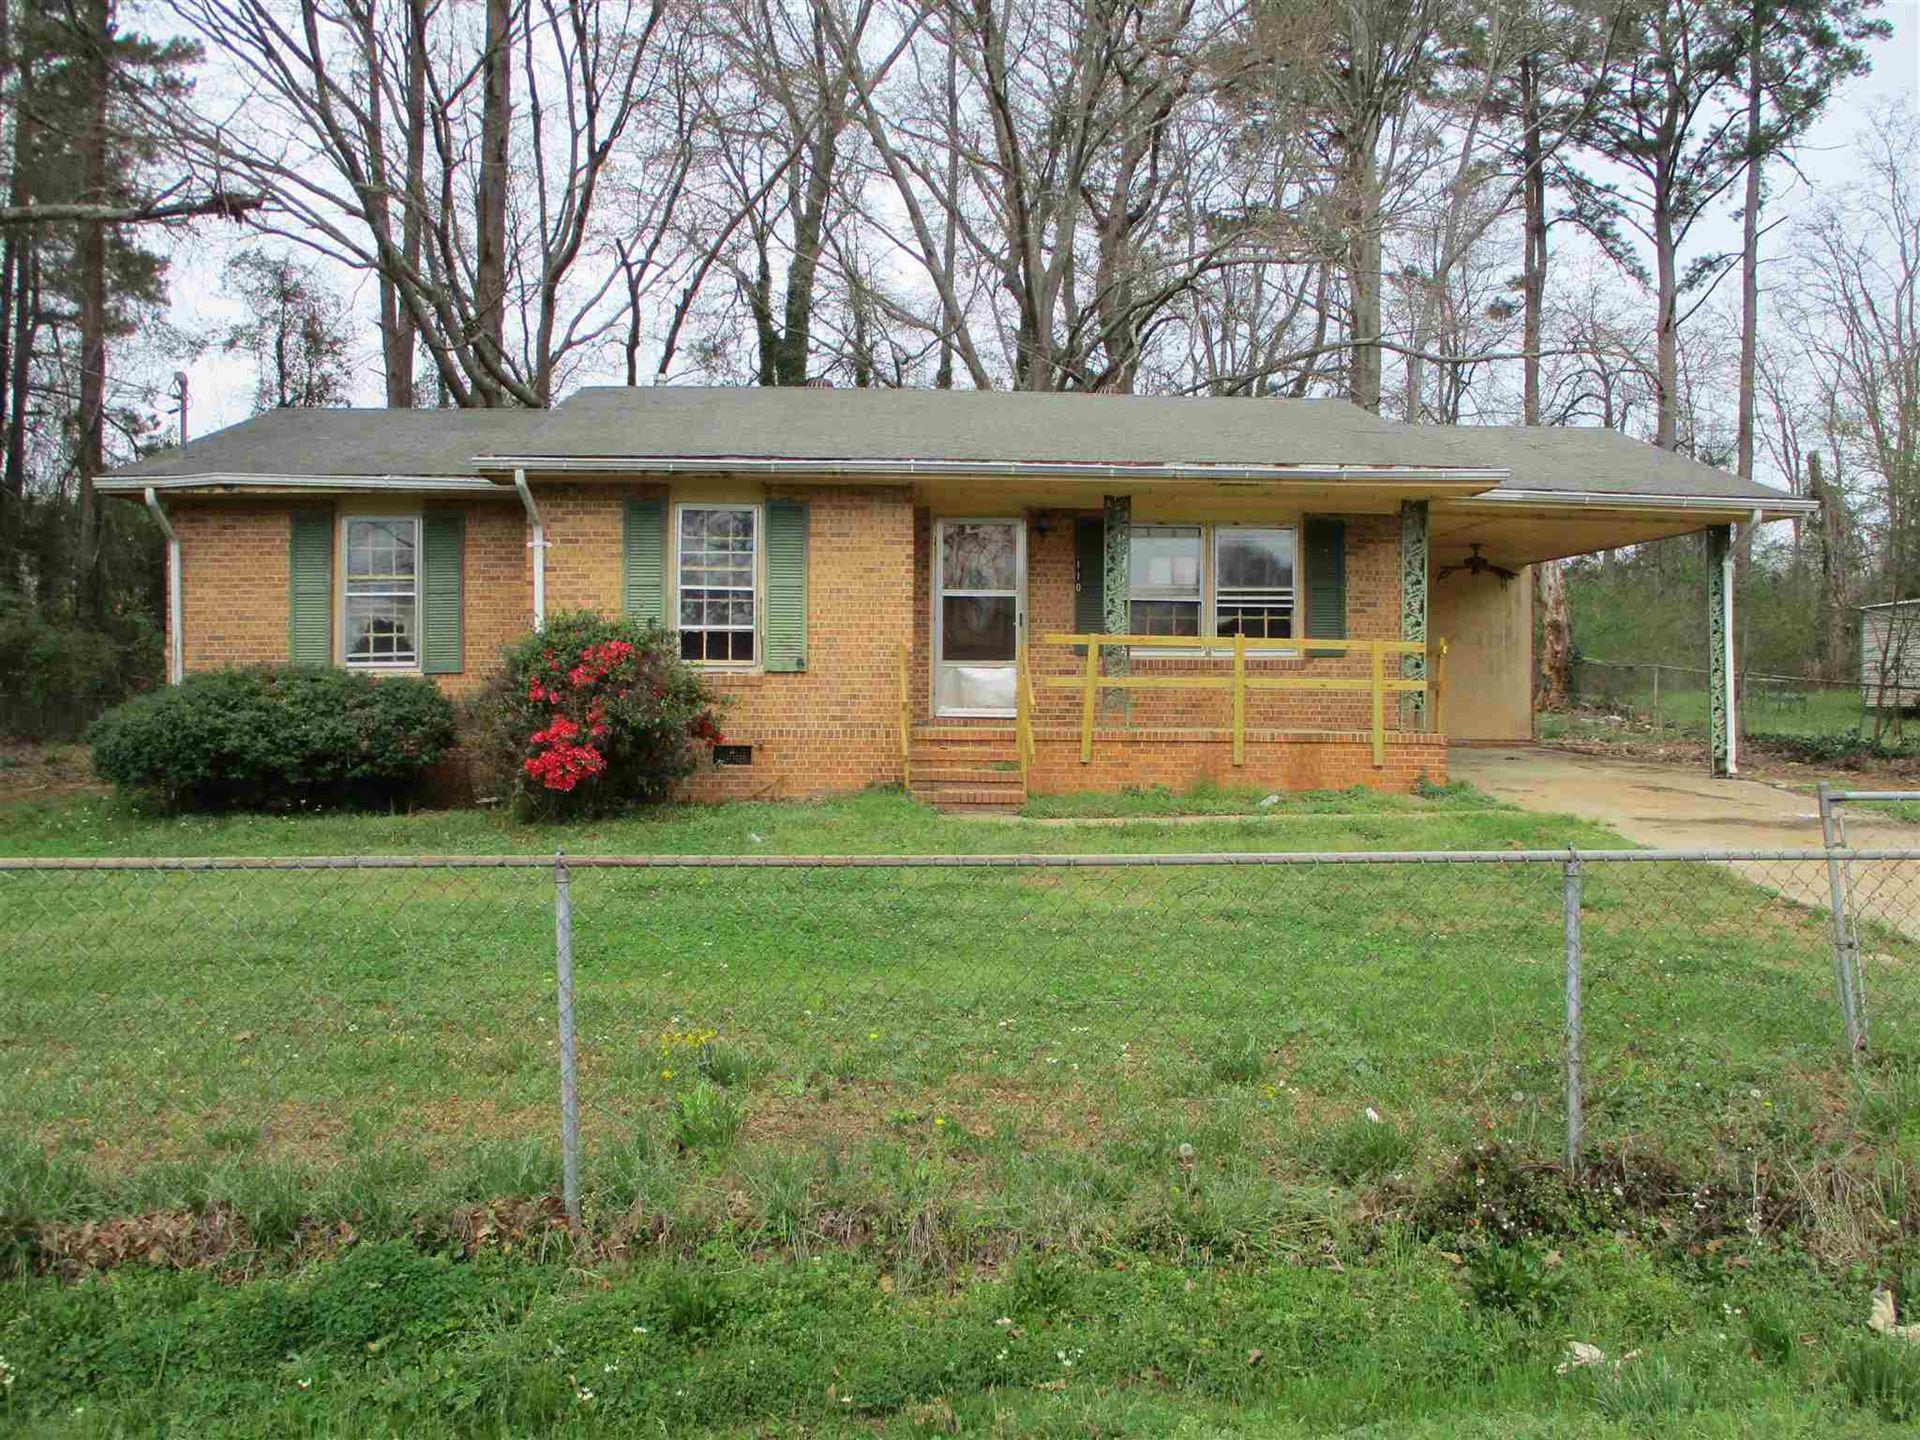 110 Sunnydale Dr, Eatonton, GA 31024 - #: 8758178